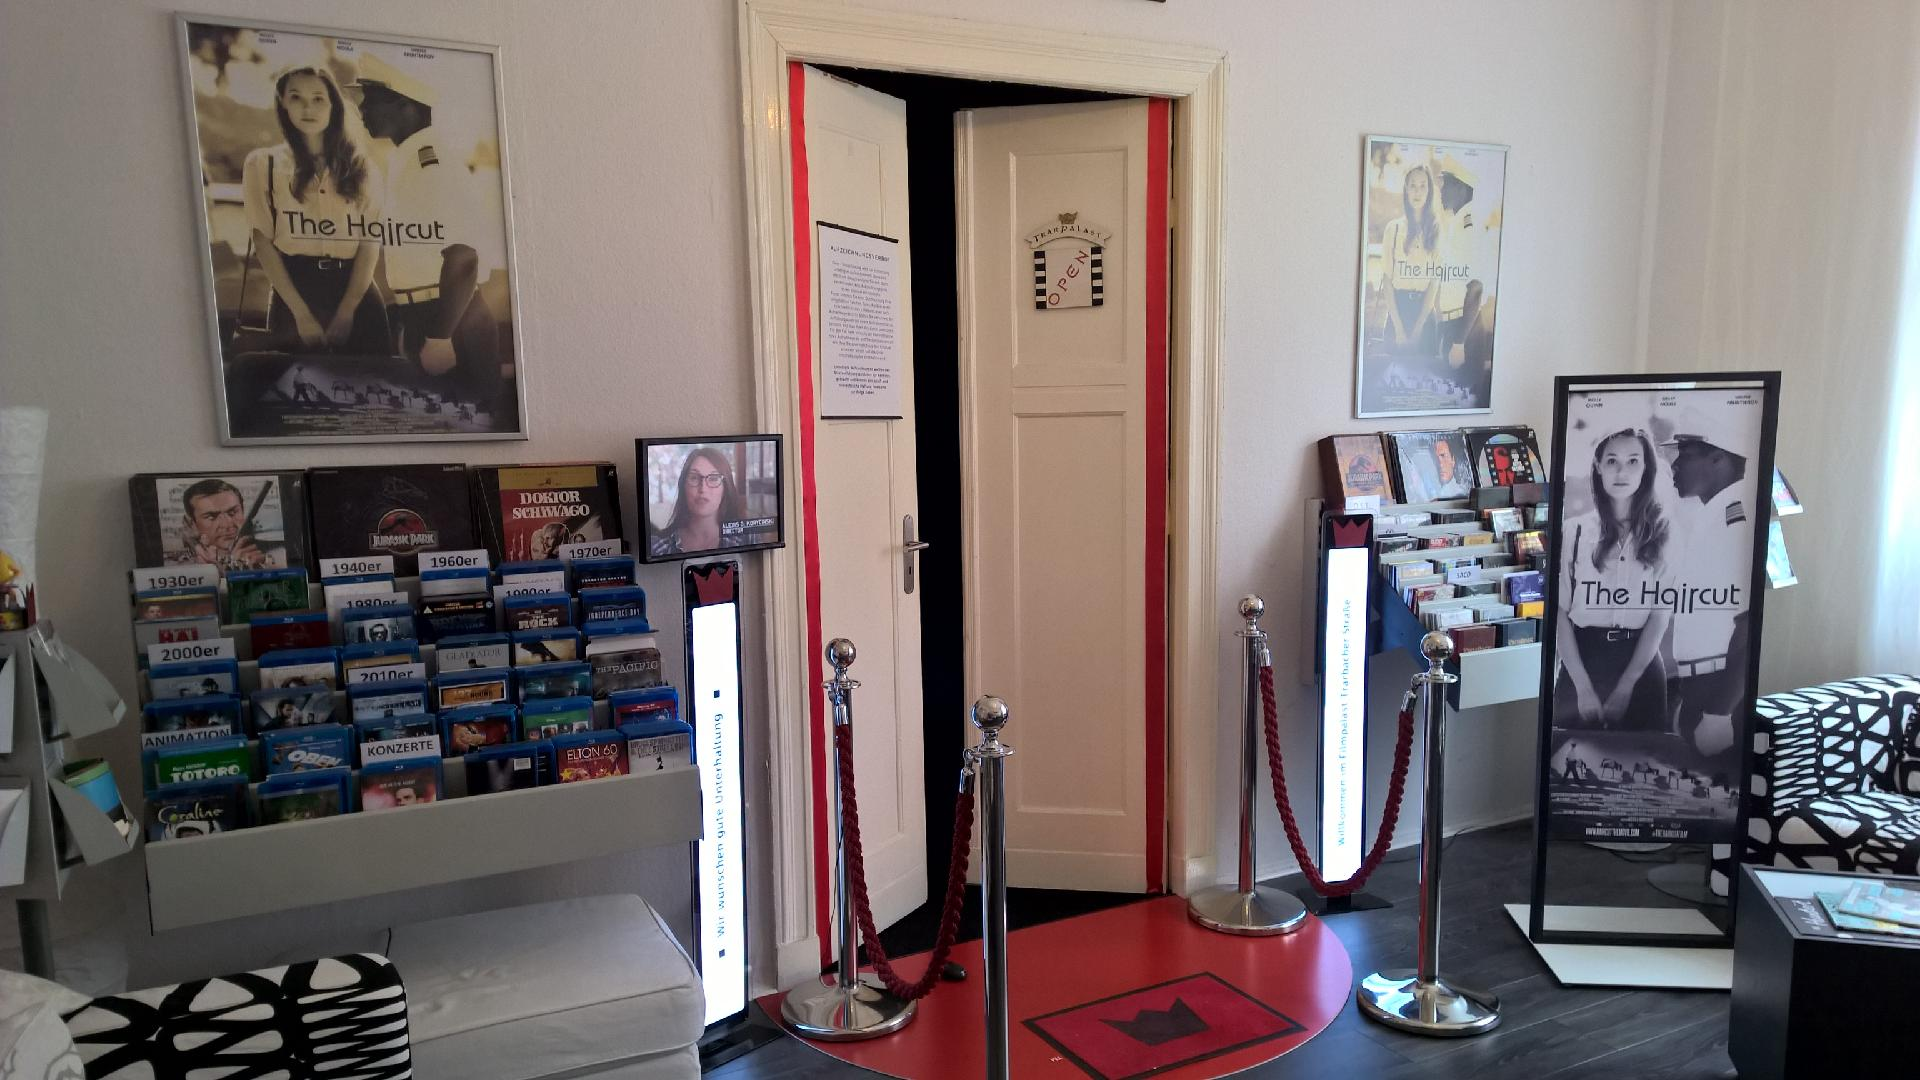 Picture 1 of Trarpalast - Berlin Screening Room inkl. Salon Flügel